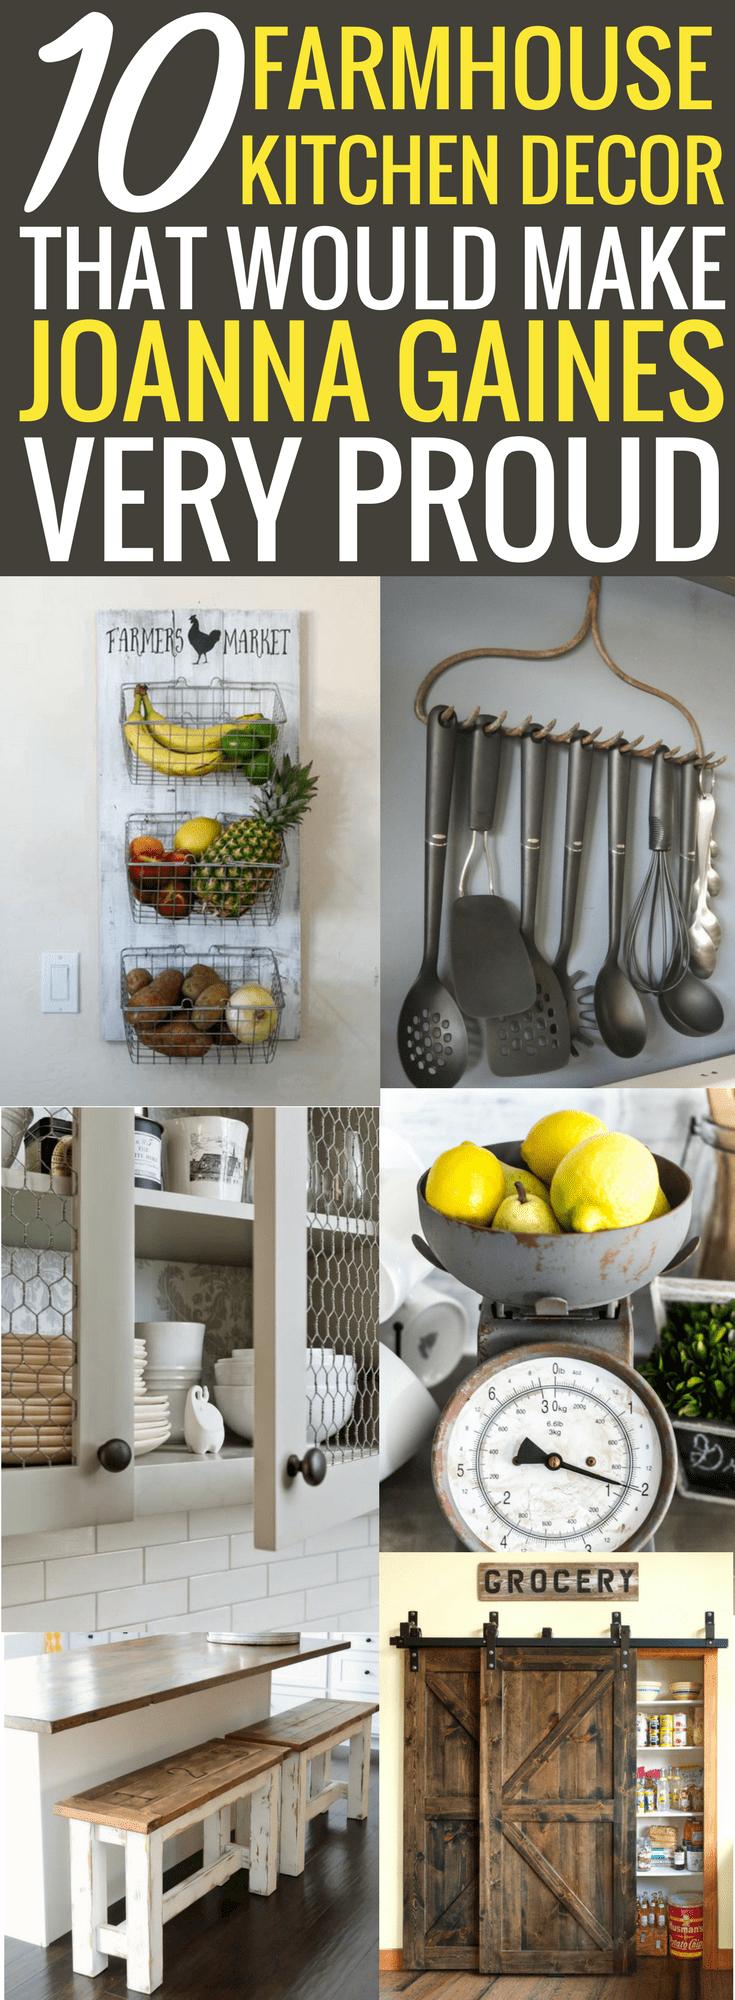 10 farmhouse kitchen decor ideas that would make joanna gaines proud farmhouse kitchen decor on farmhouse kitchen joanna gaines design id=19075